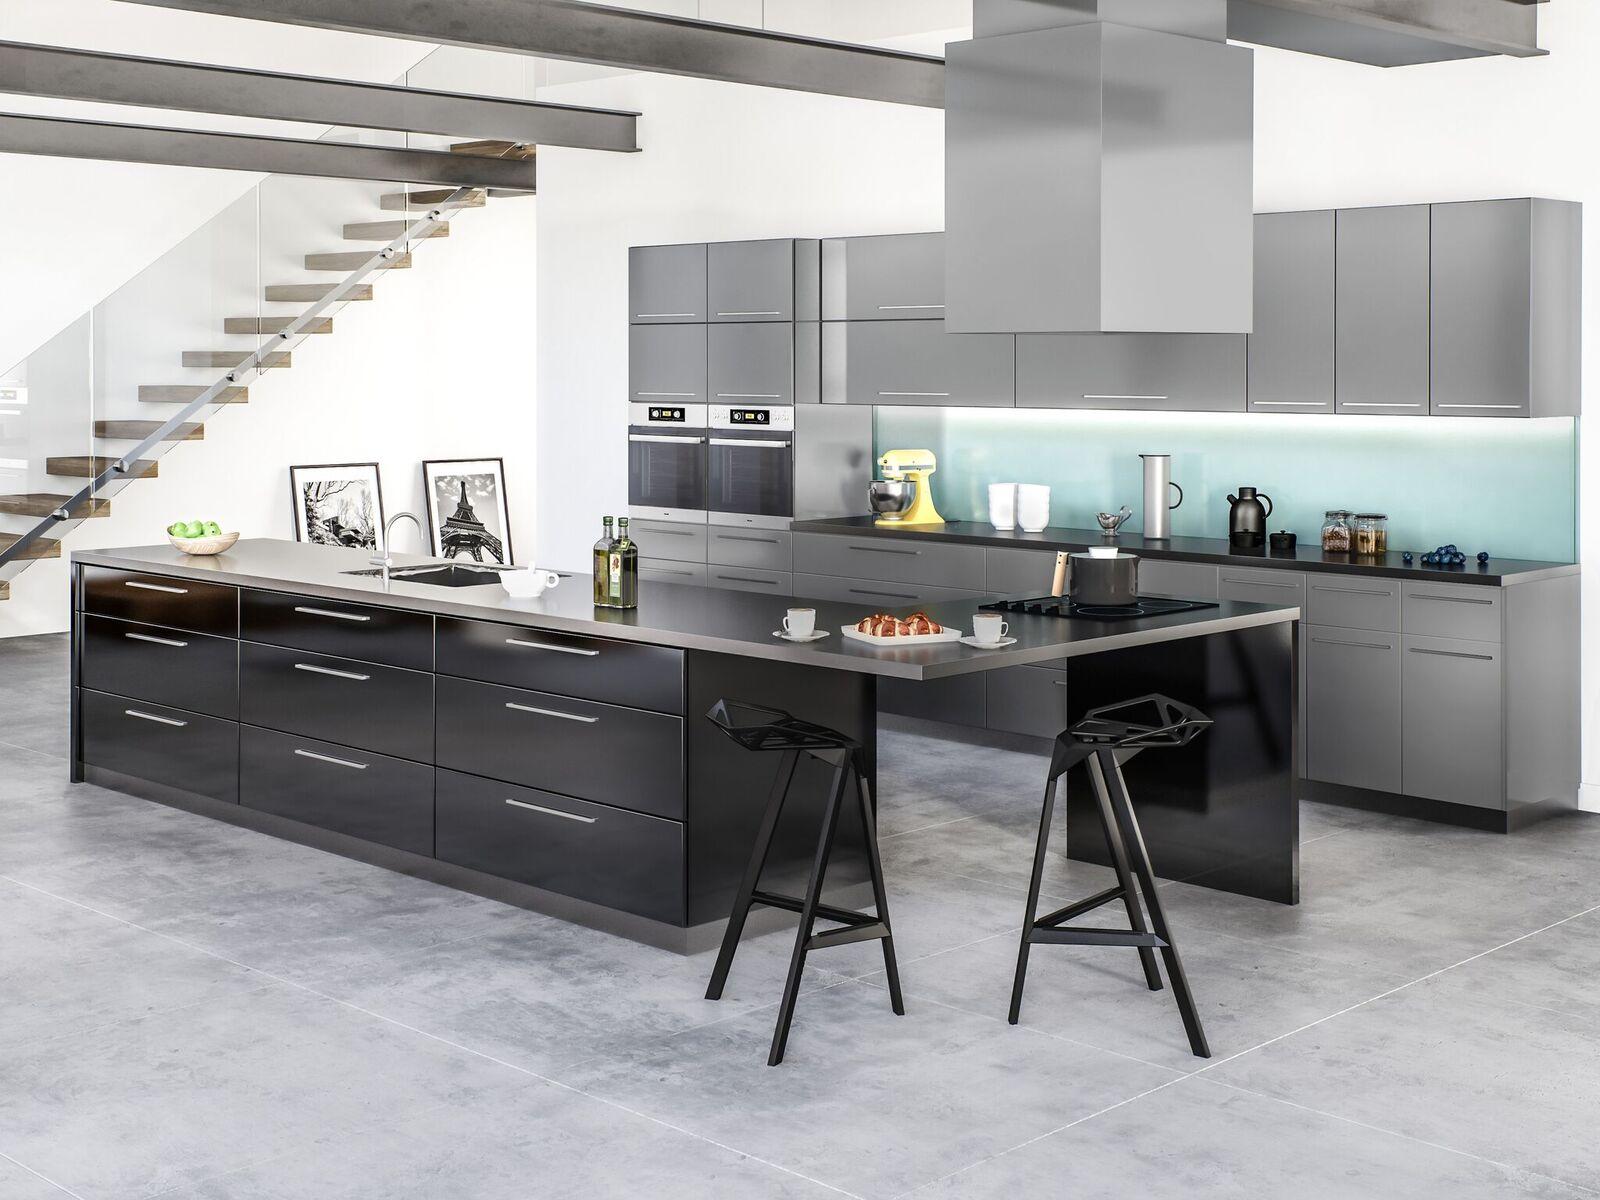 Milano slate - Entrepot-cuisine-CUISINE-armoires de cuisine